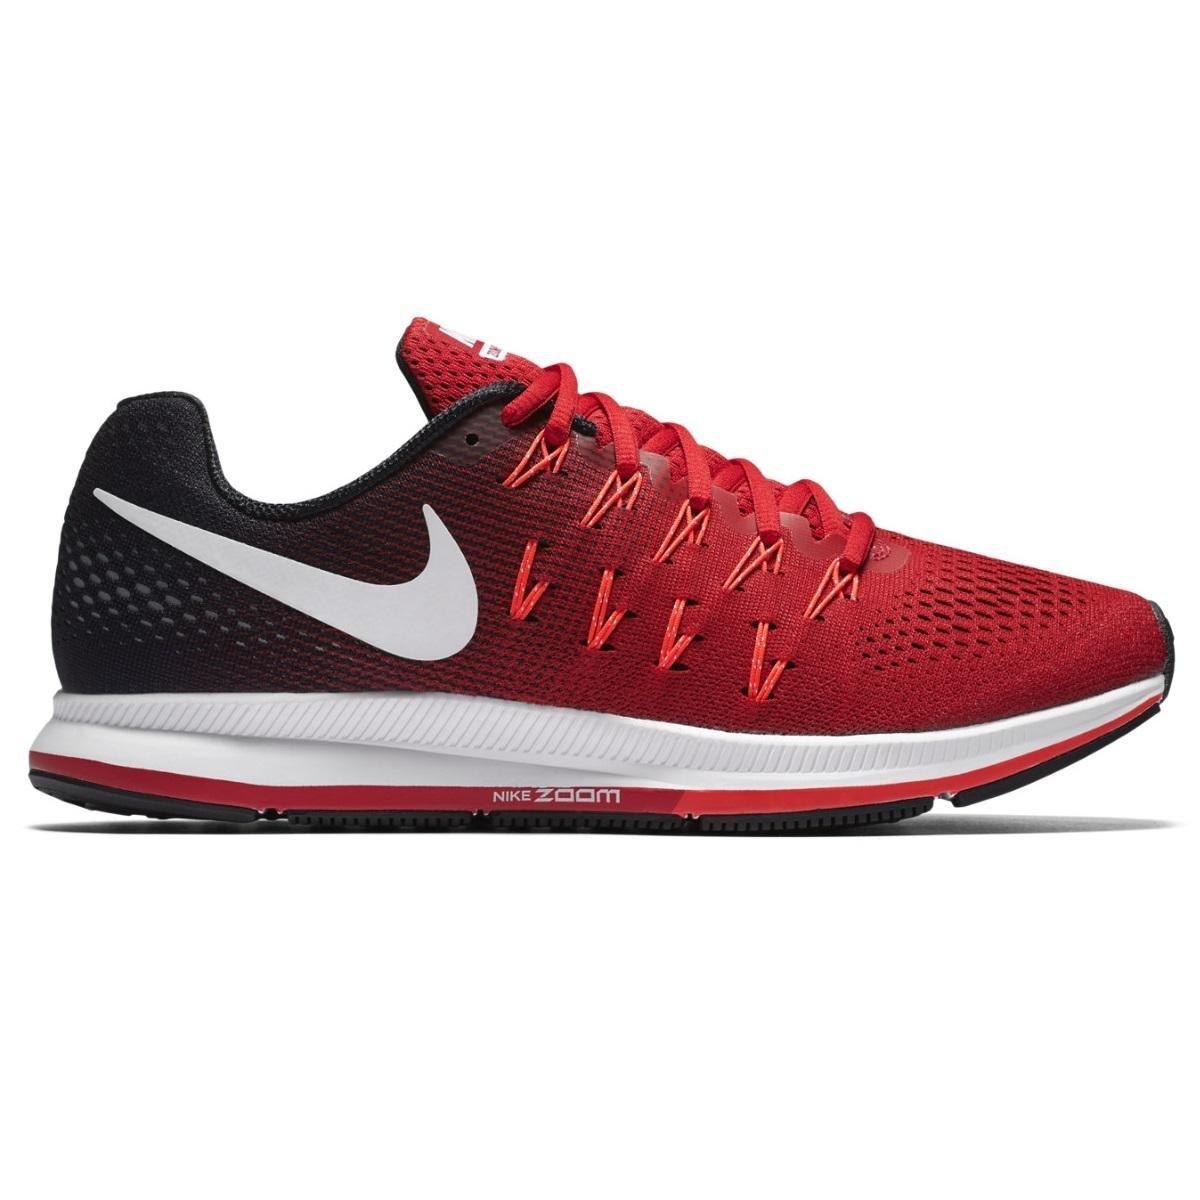 Nike Men's Air Zoom Pegasus 33, University Red/White/Black - 10.5 D(M) US